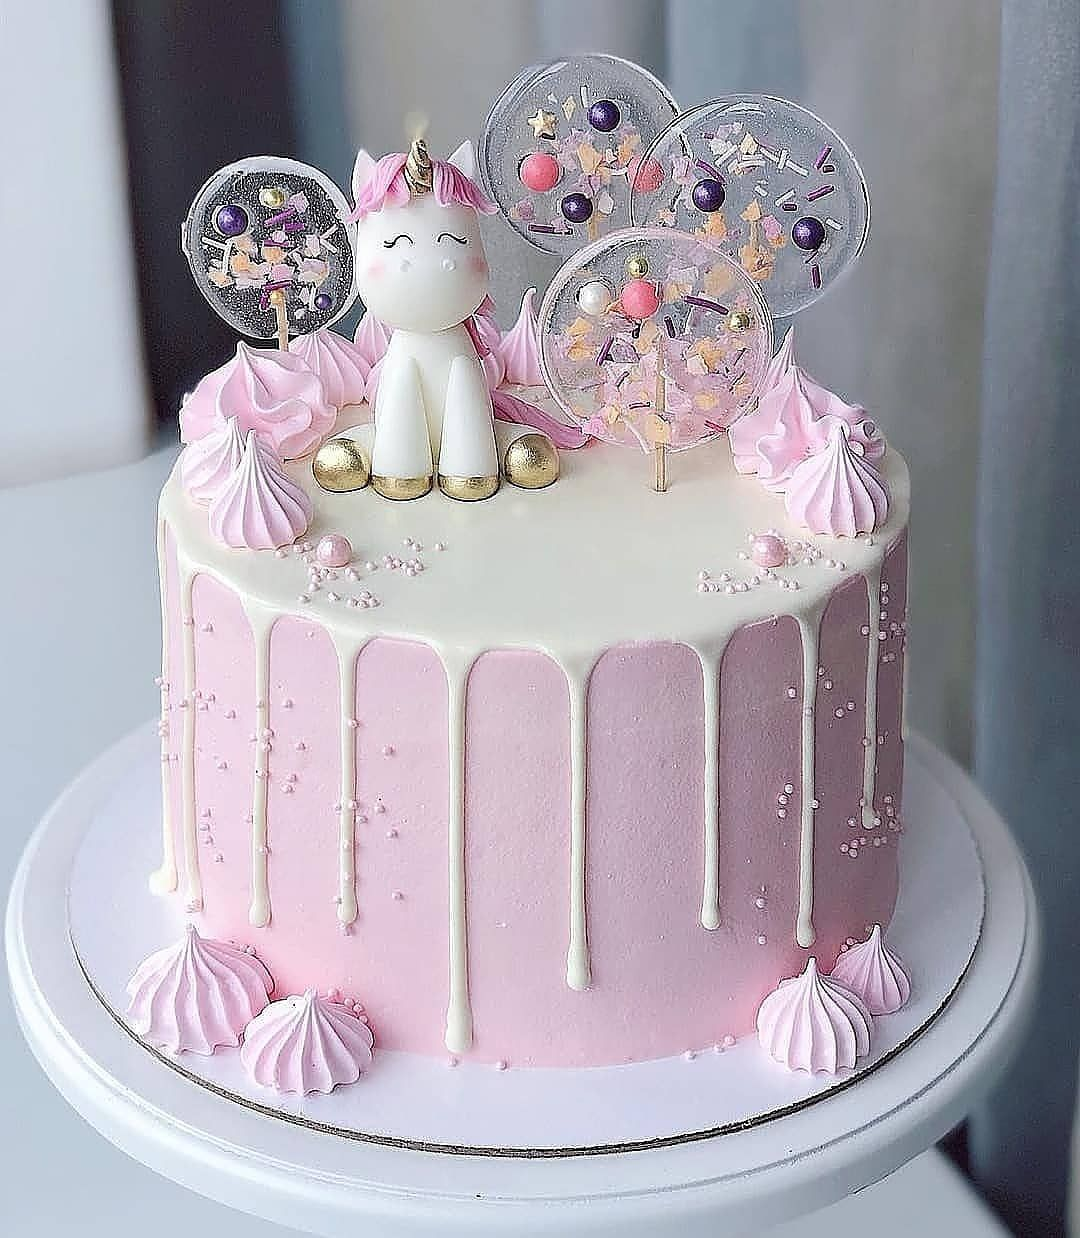 Have A Sweet Weekend Follow Fashellena Link In Bio Cake Cakedecorating Yummy Pasteles Divertidos Pastel De Fiesta Ideas De Pastel De Cumpleanos